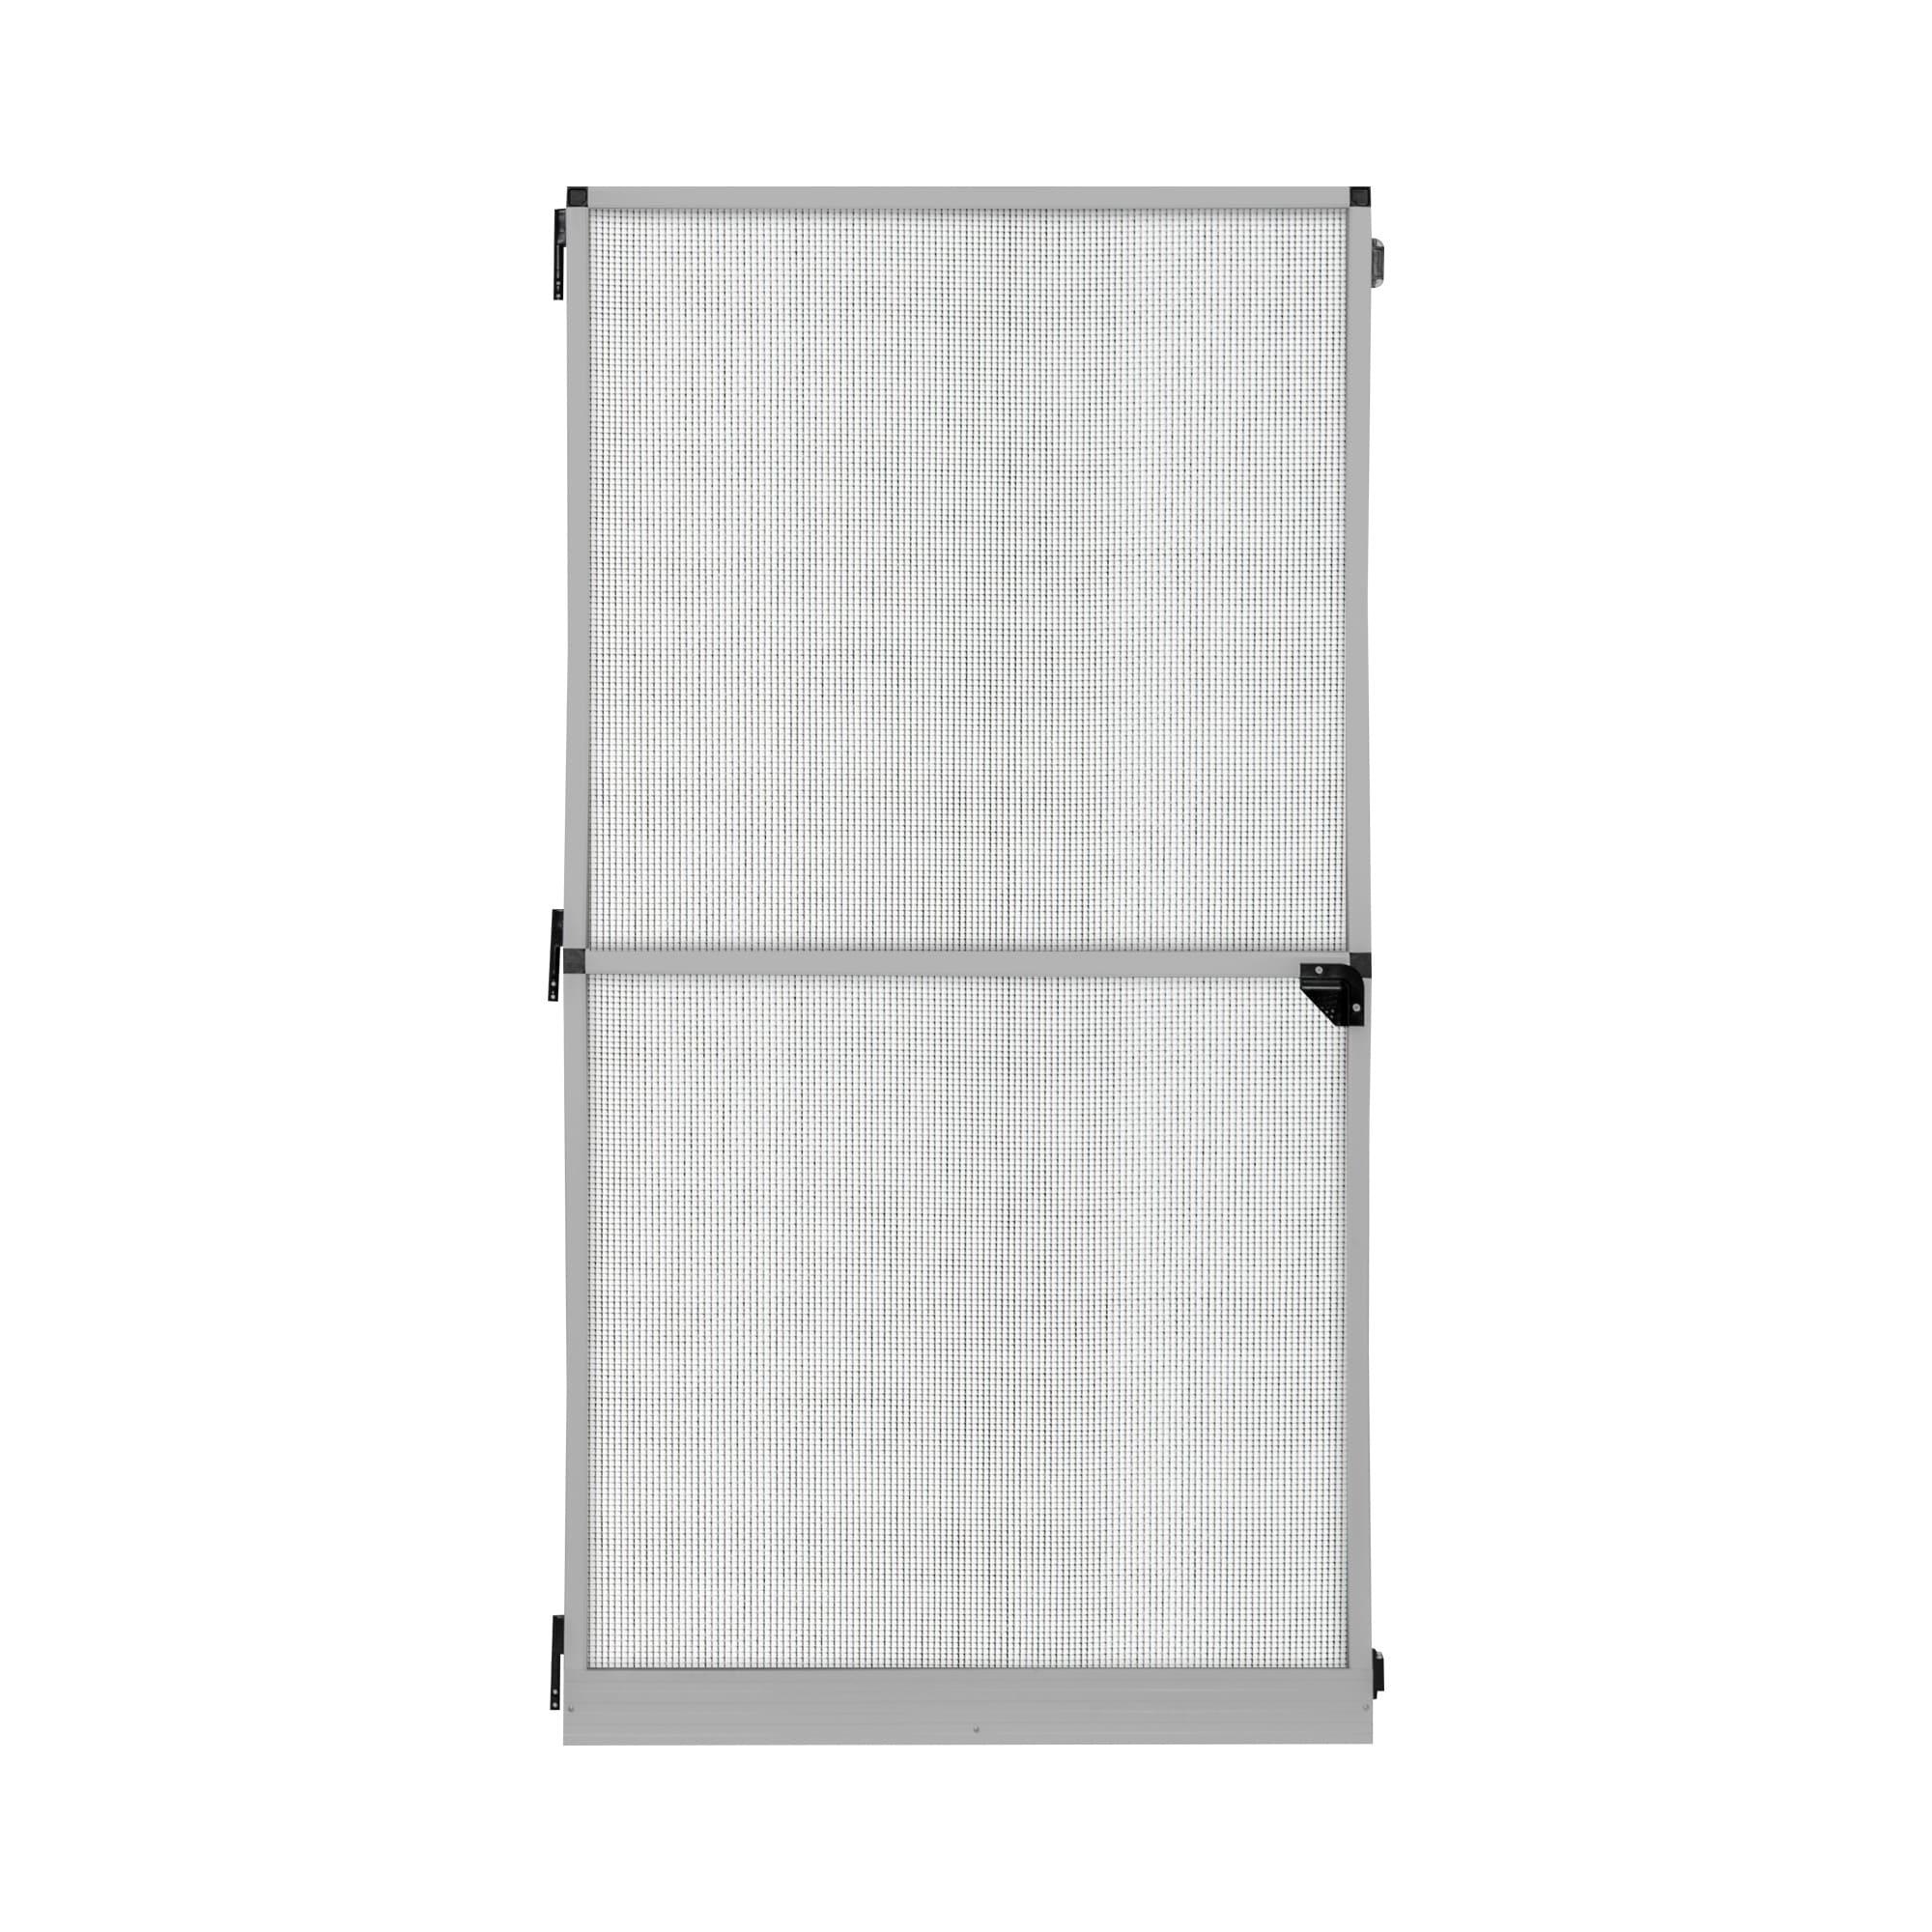 Fliegengitter-Tuerrahmen-Insektenschutz-Tuer-Drehrahmen-Rahmen-Tuergitter-120x220cm Indexbild 11